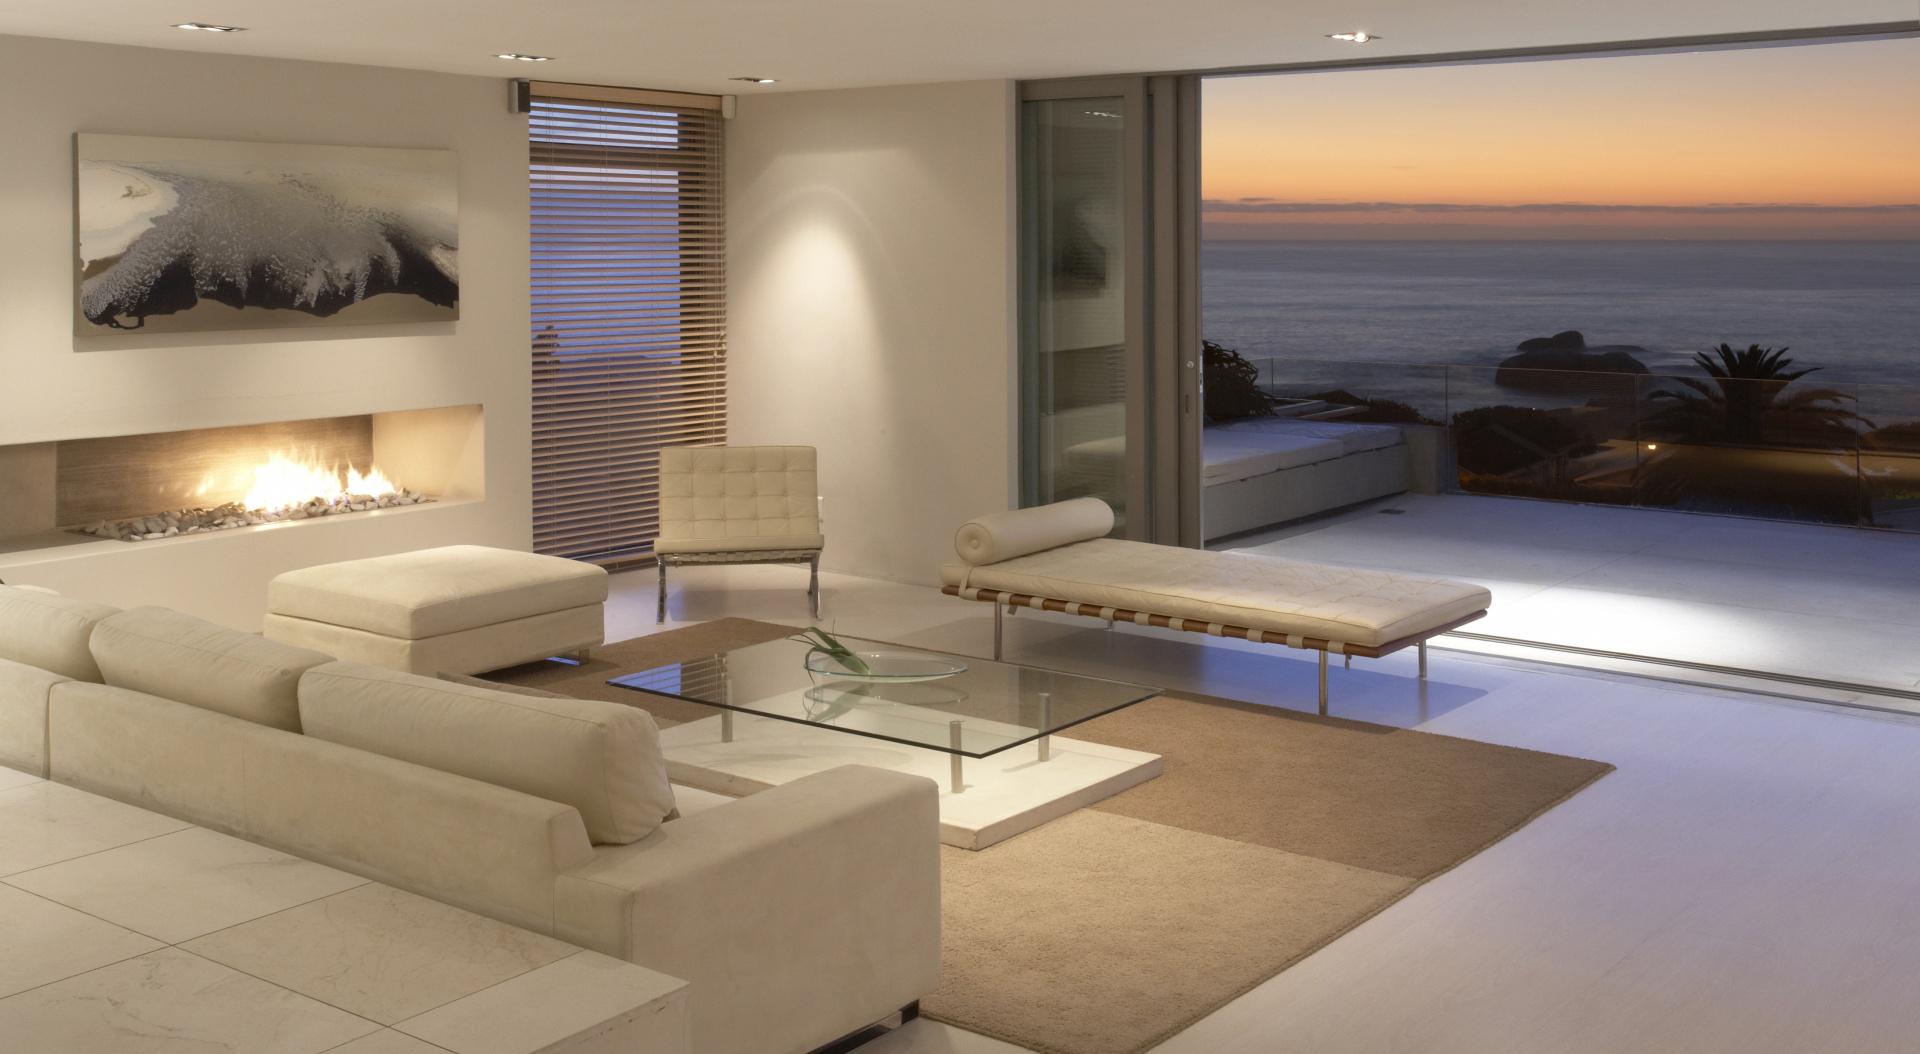 Best Quotes Wallpapers Hd For Desktop Apartment Backgrounds Free Download Pixelstalk Net